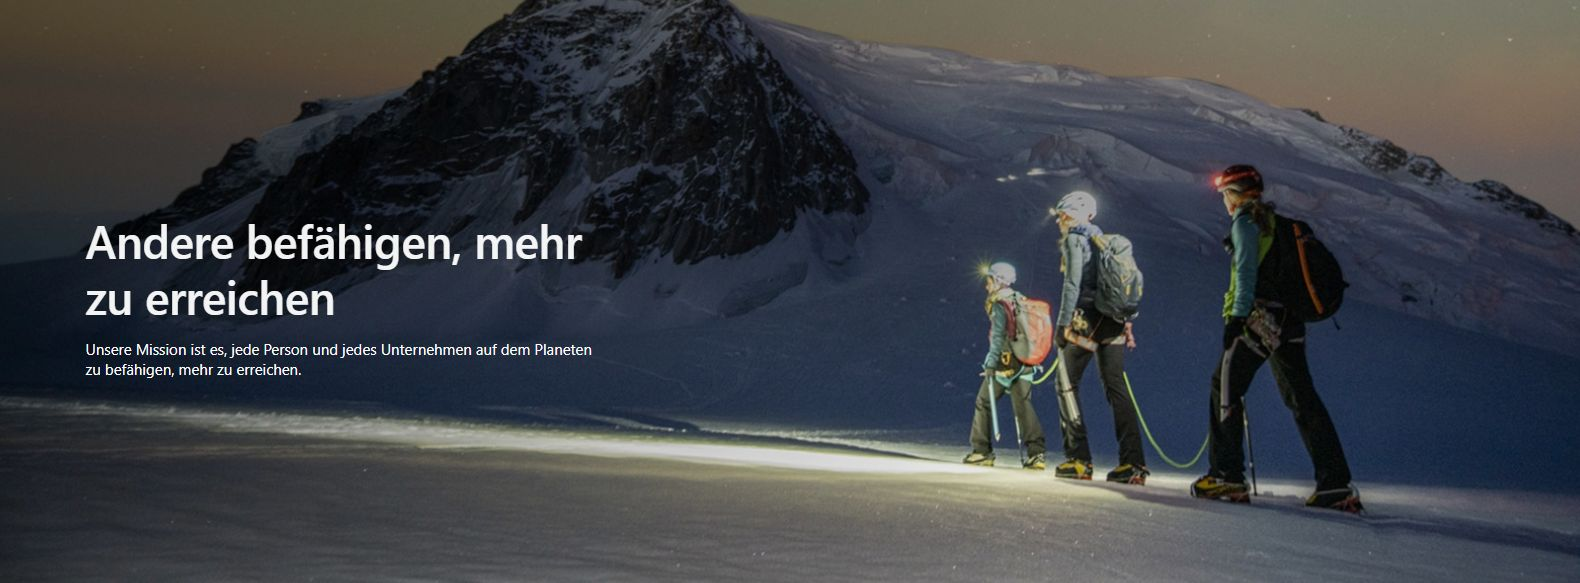 Auch Microsoft will nur unser Bestes (Screenshot: Microsoft.com)